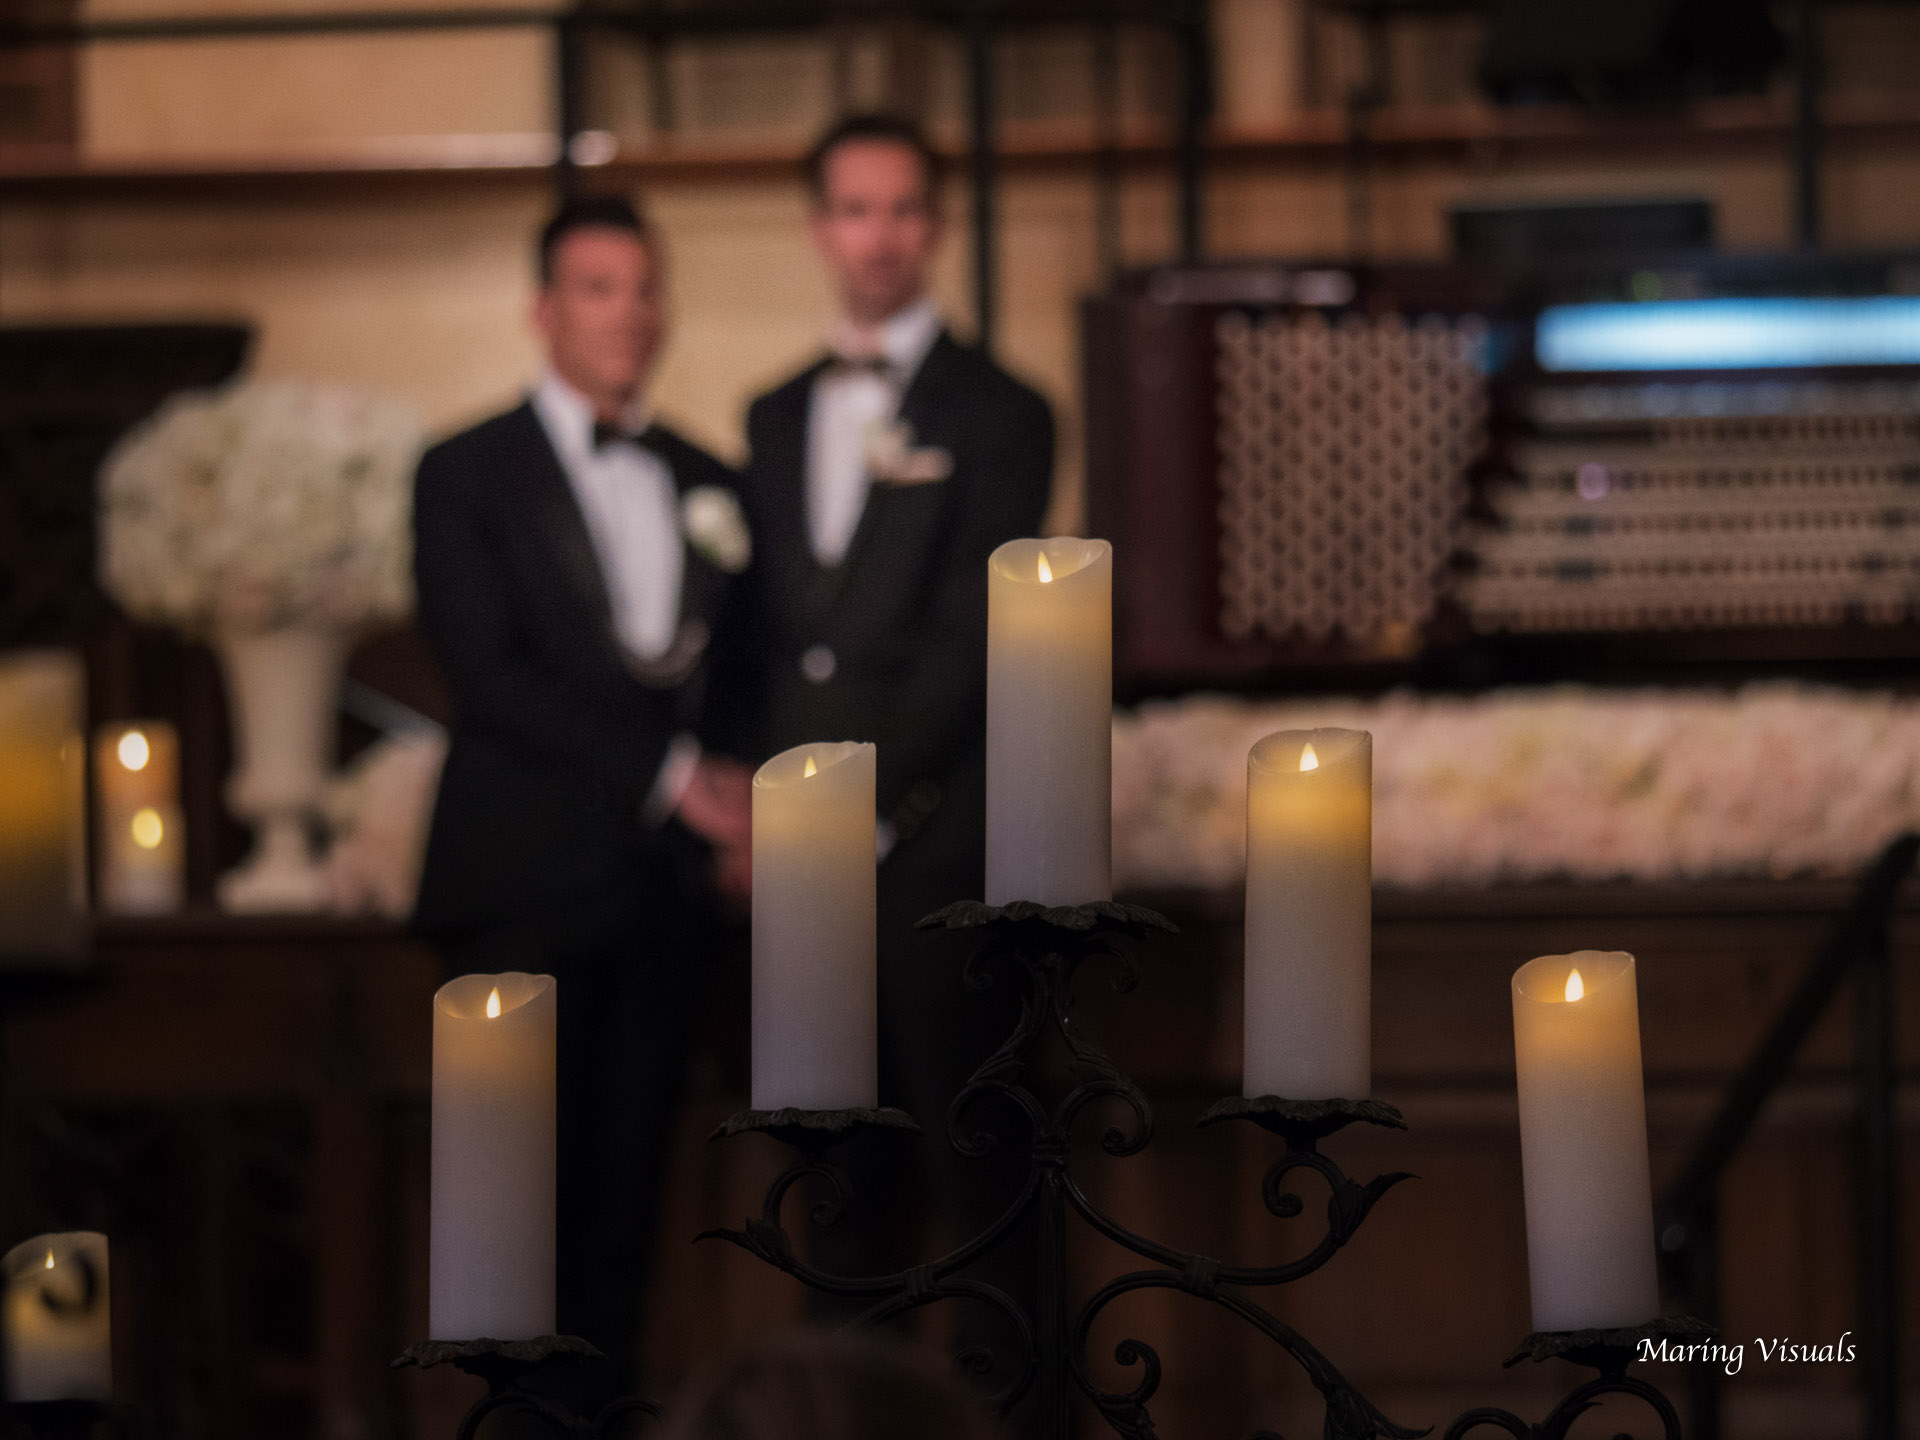 David Tutera Weddings by Maring Visuals 00530.jpg